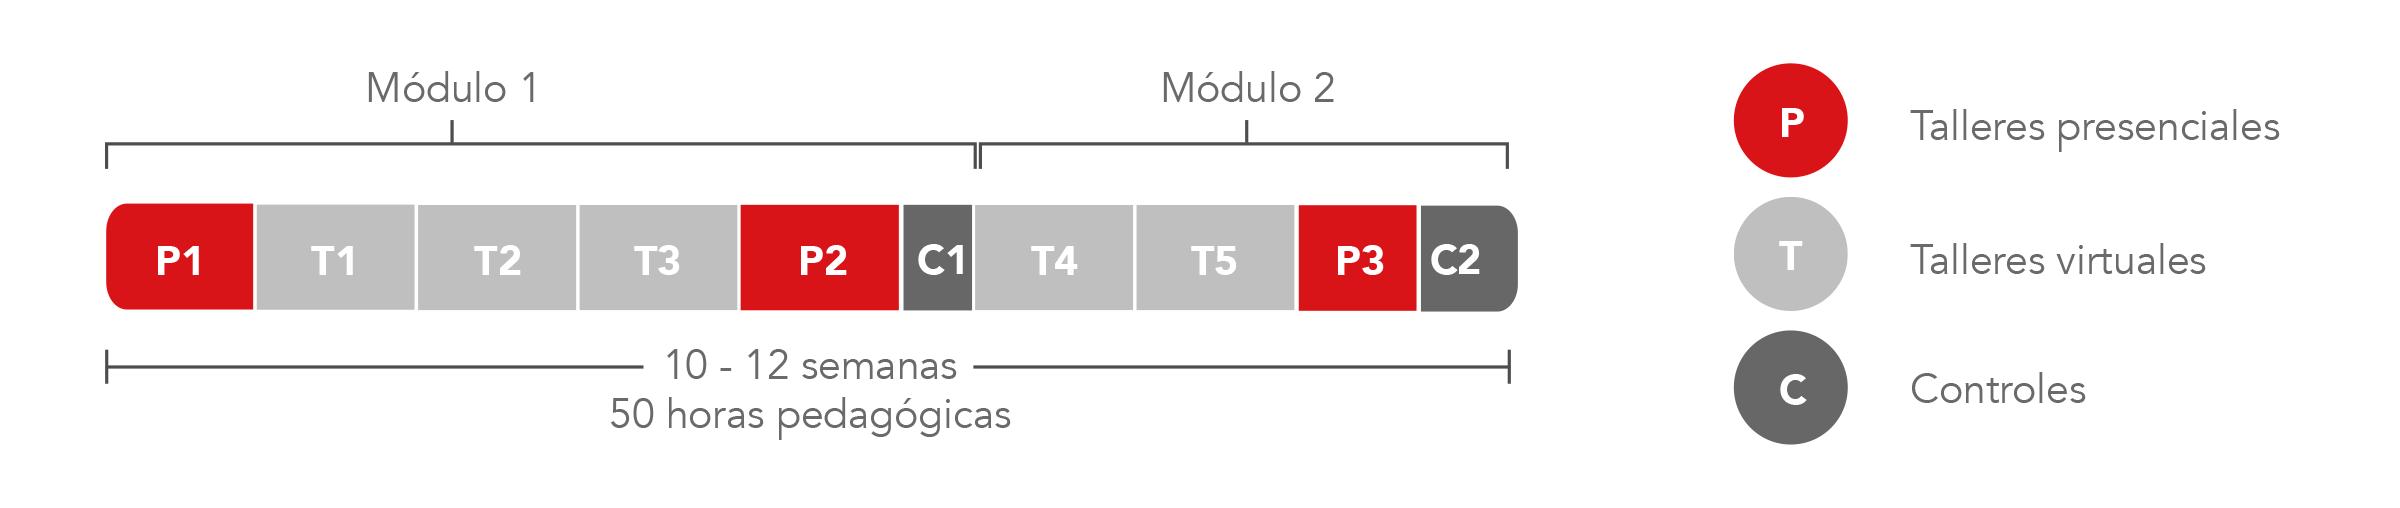 Estructura imagen